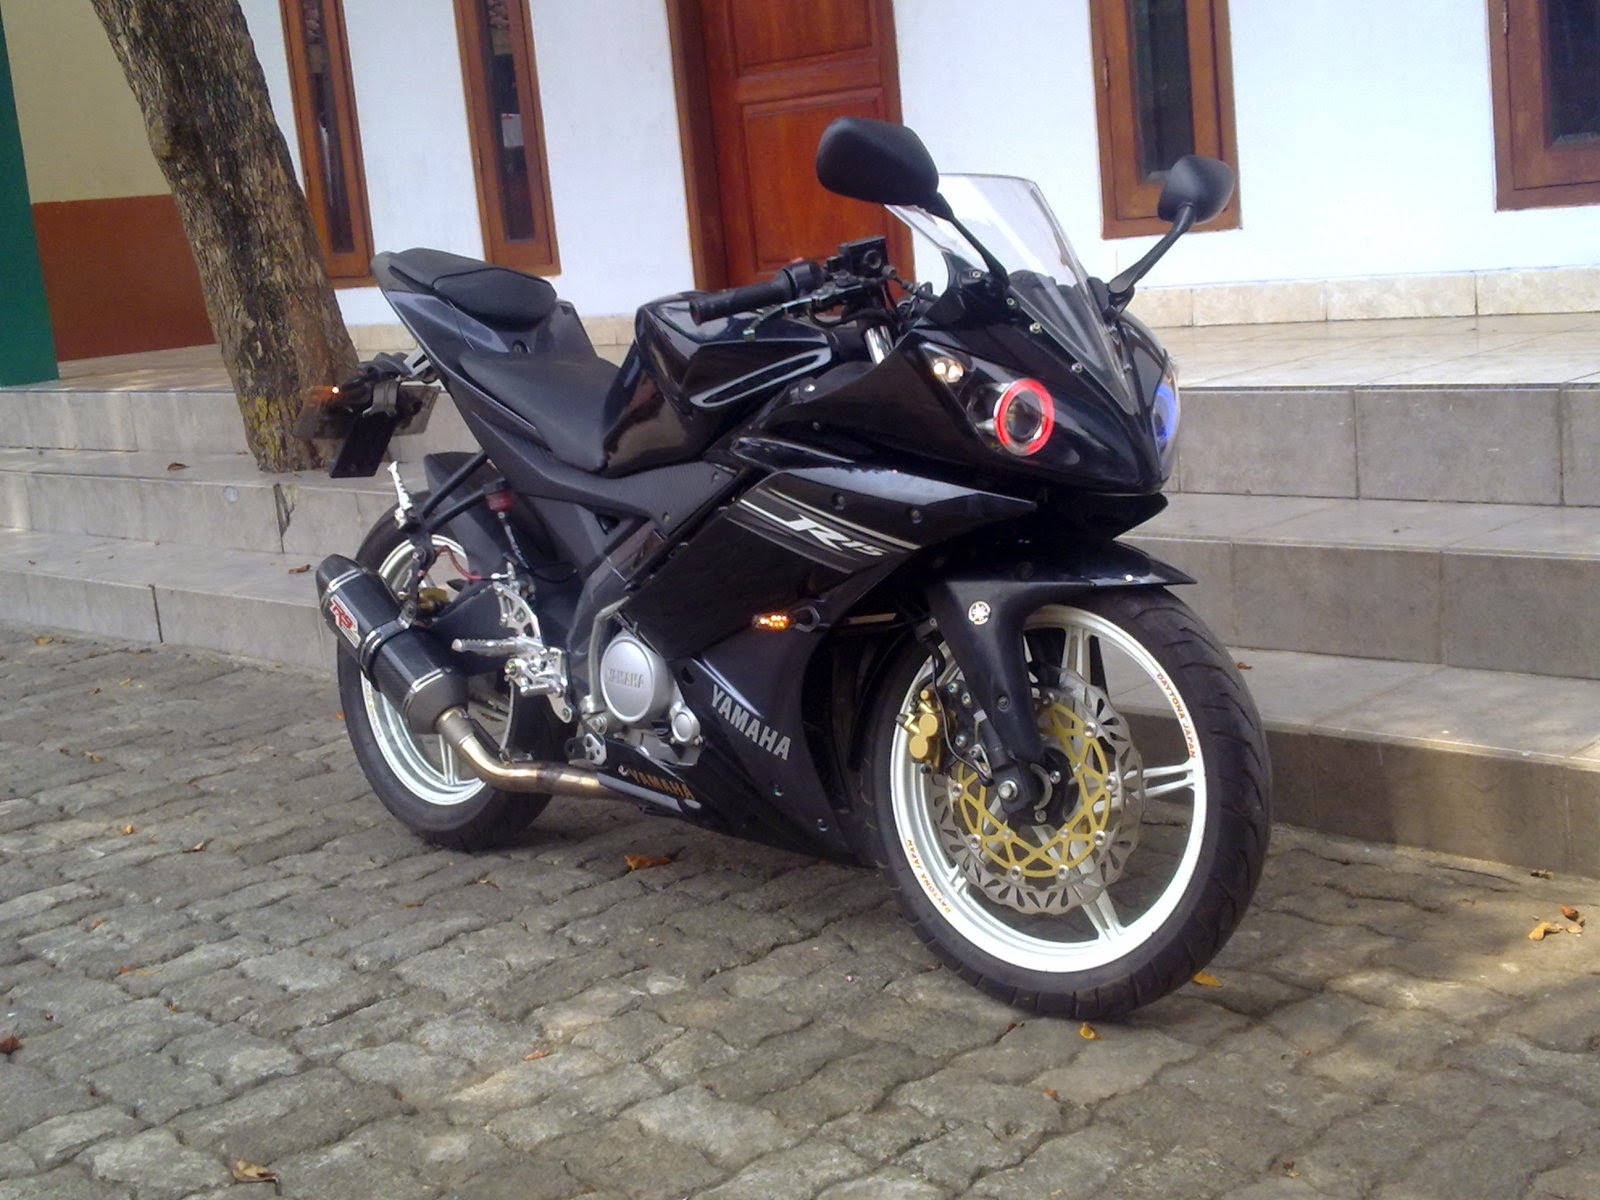 Modifikasi Yamaha Vixion Gp Modifikasi Motor Yamaha